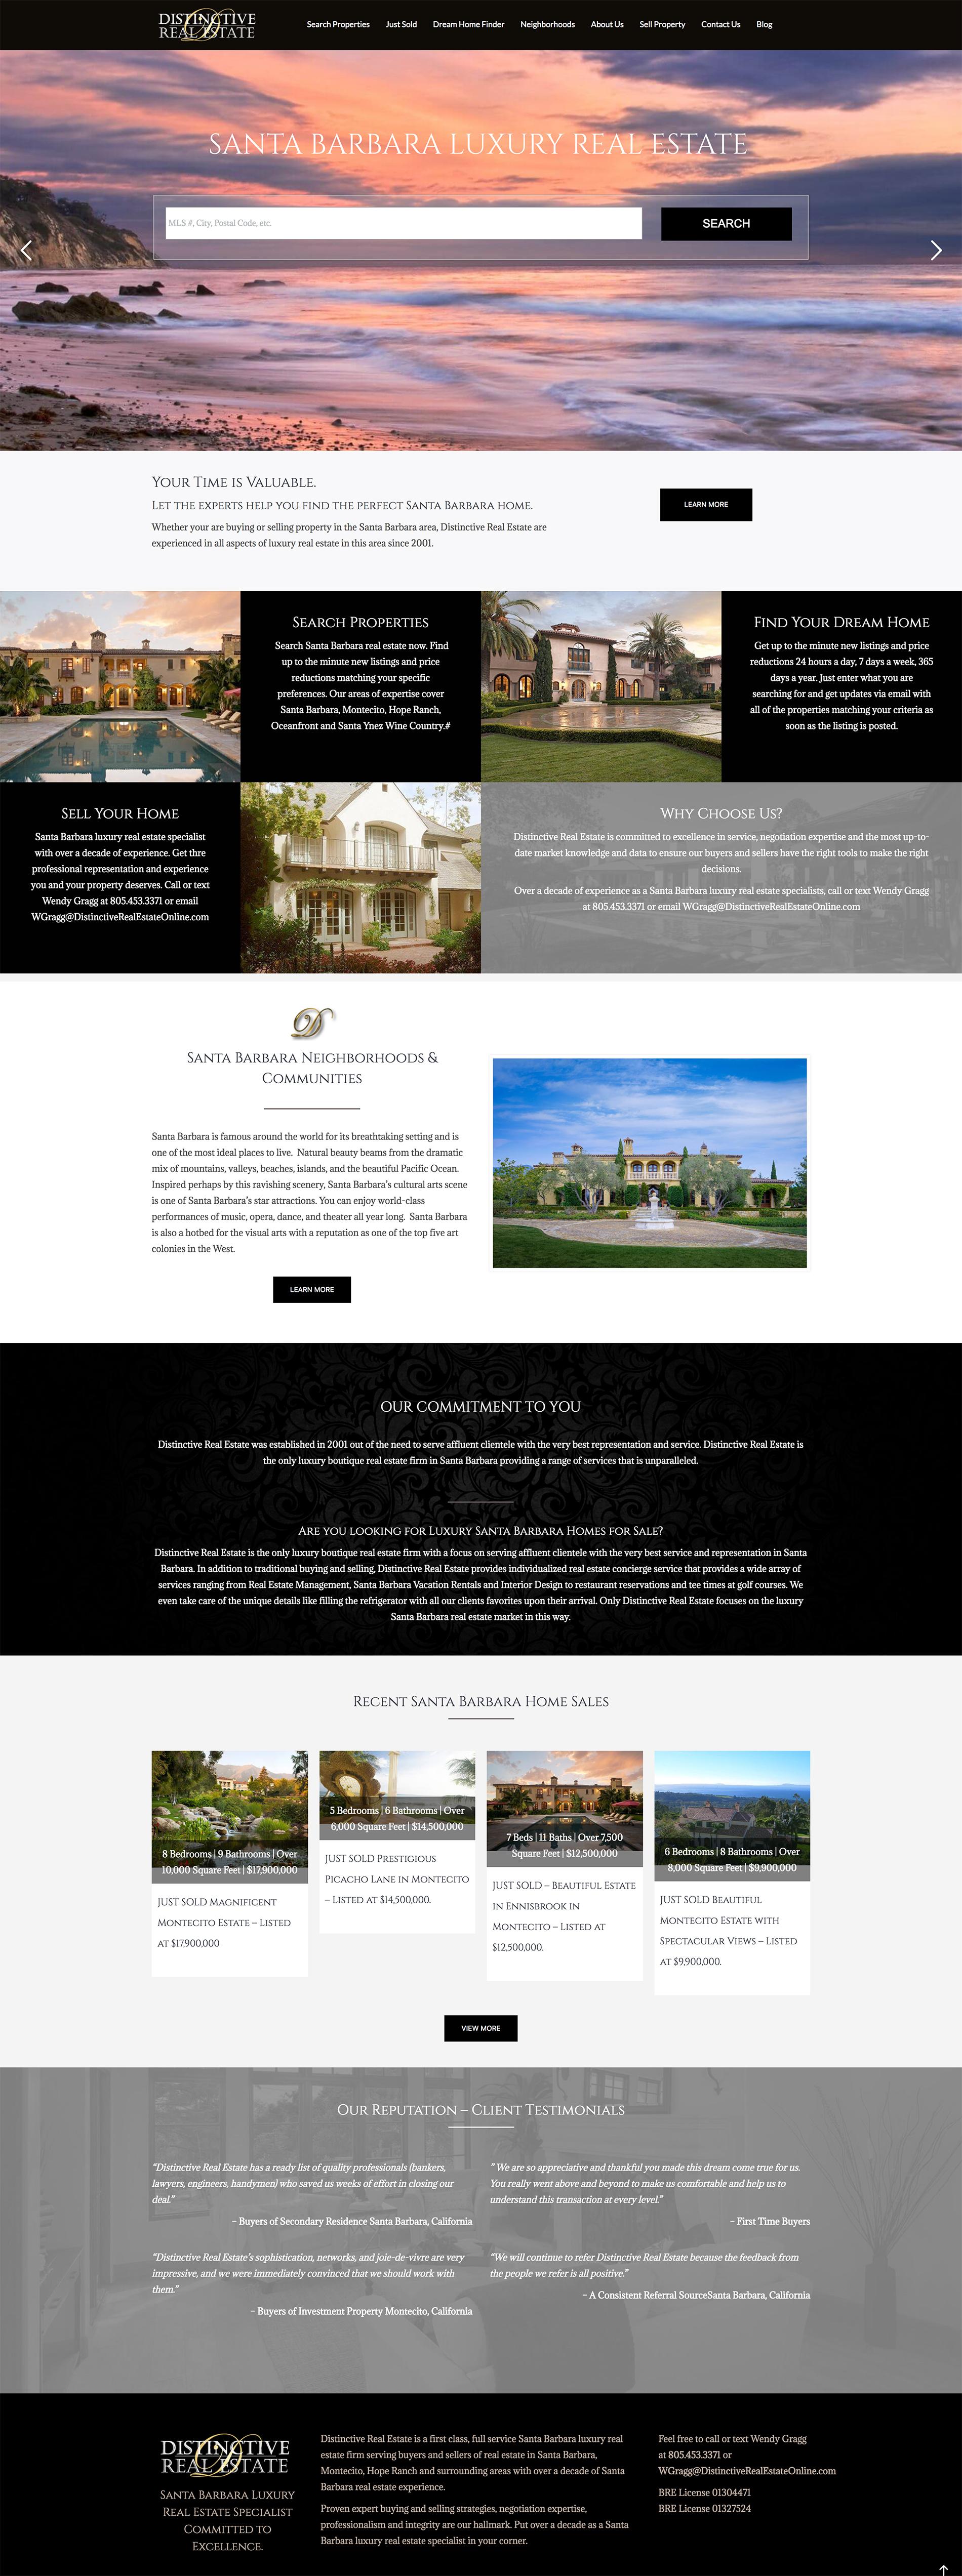 Distinctive Real Estate